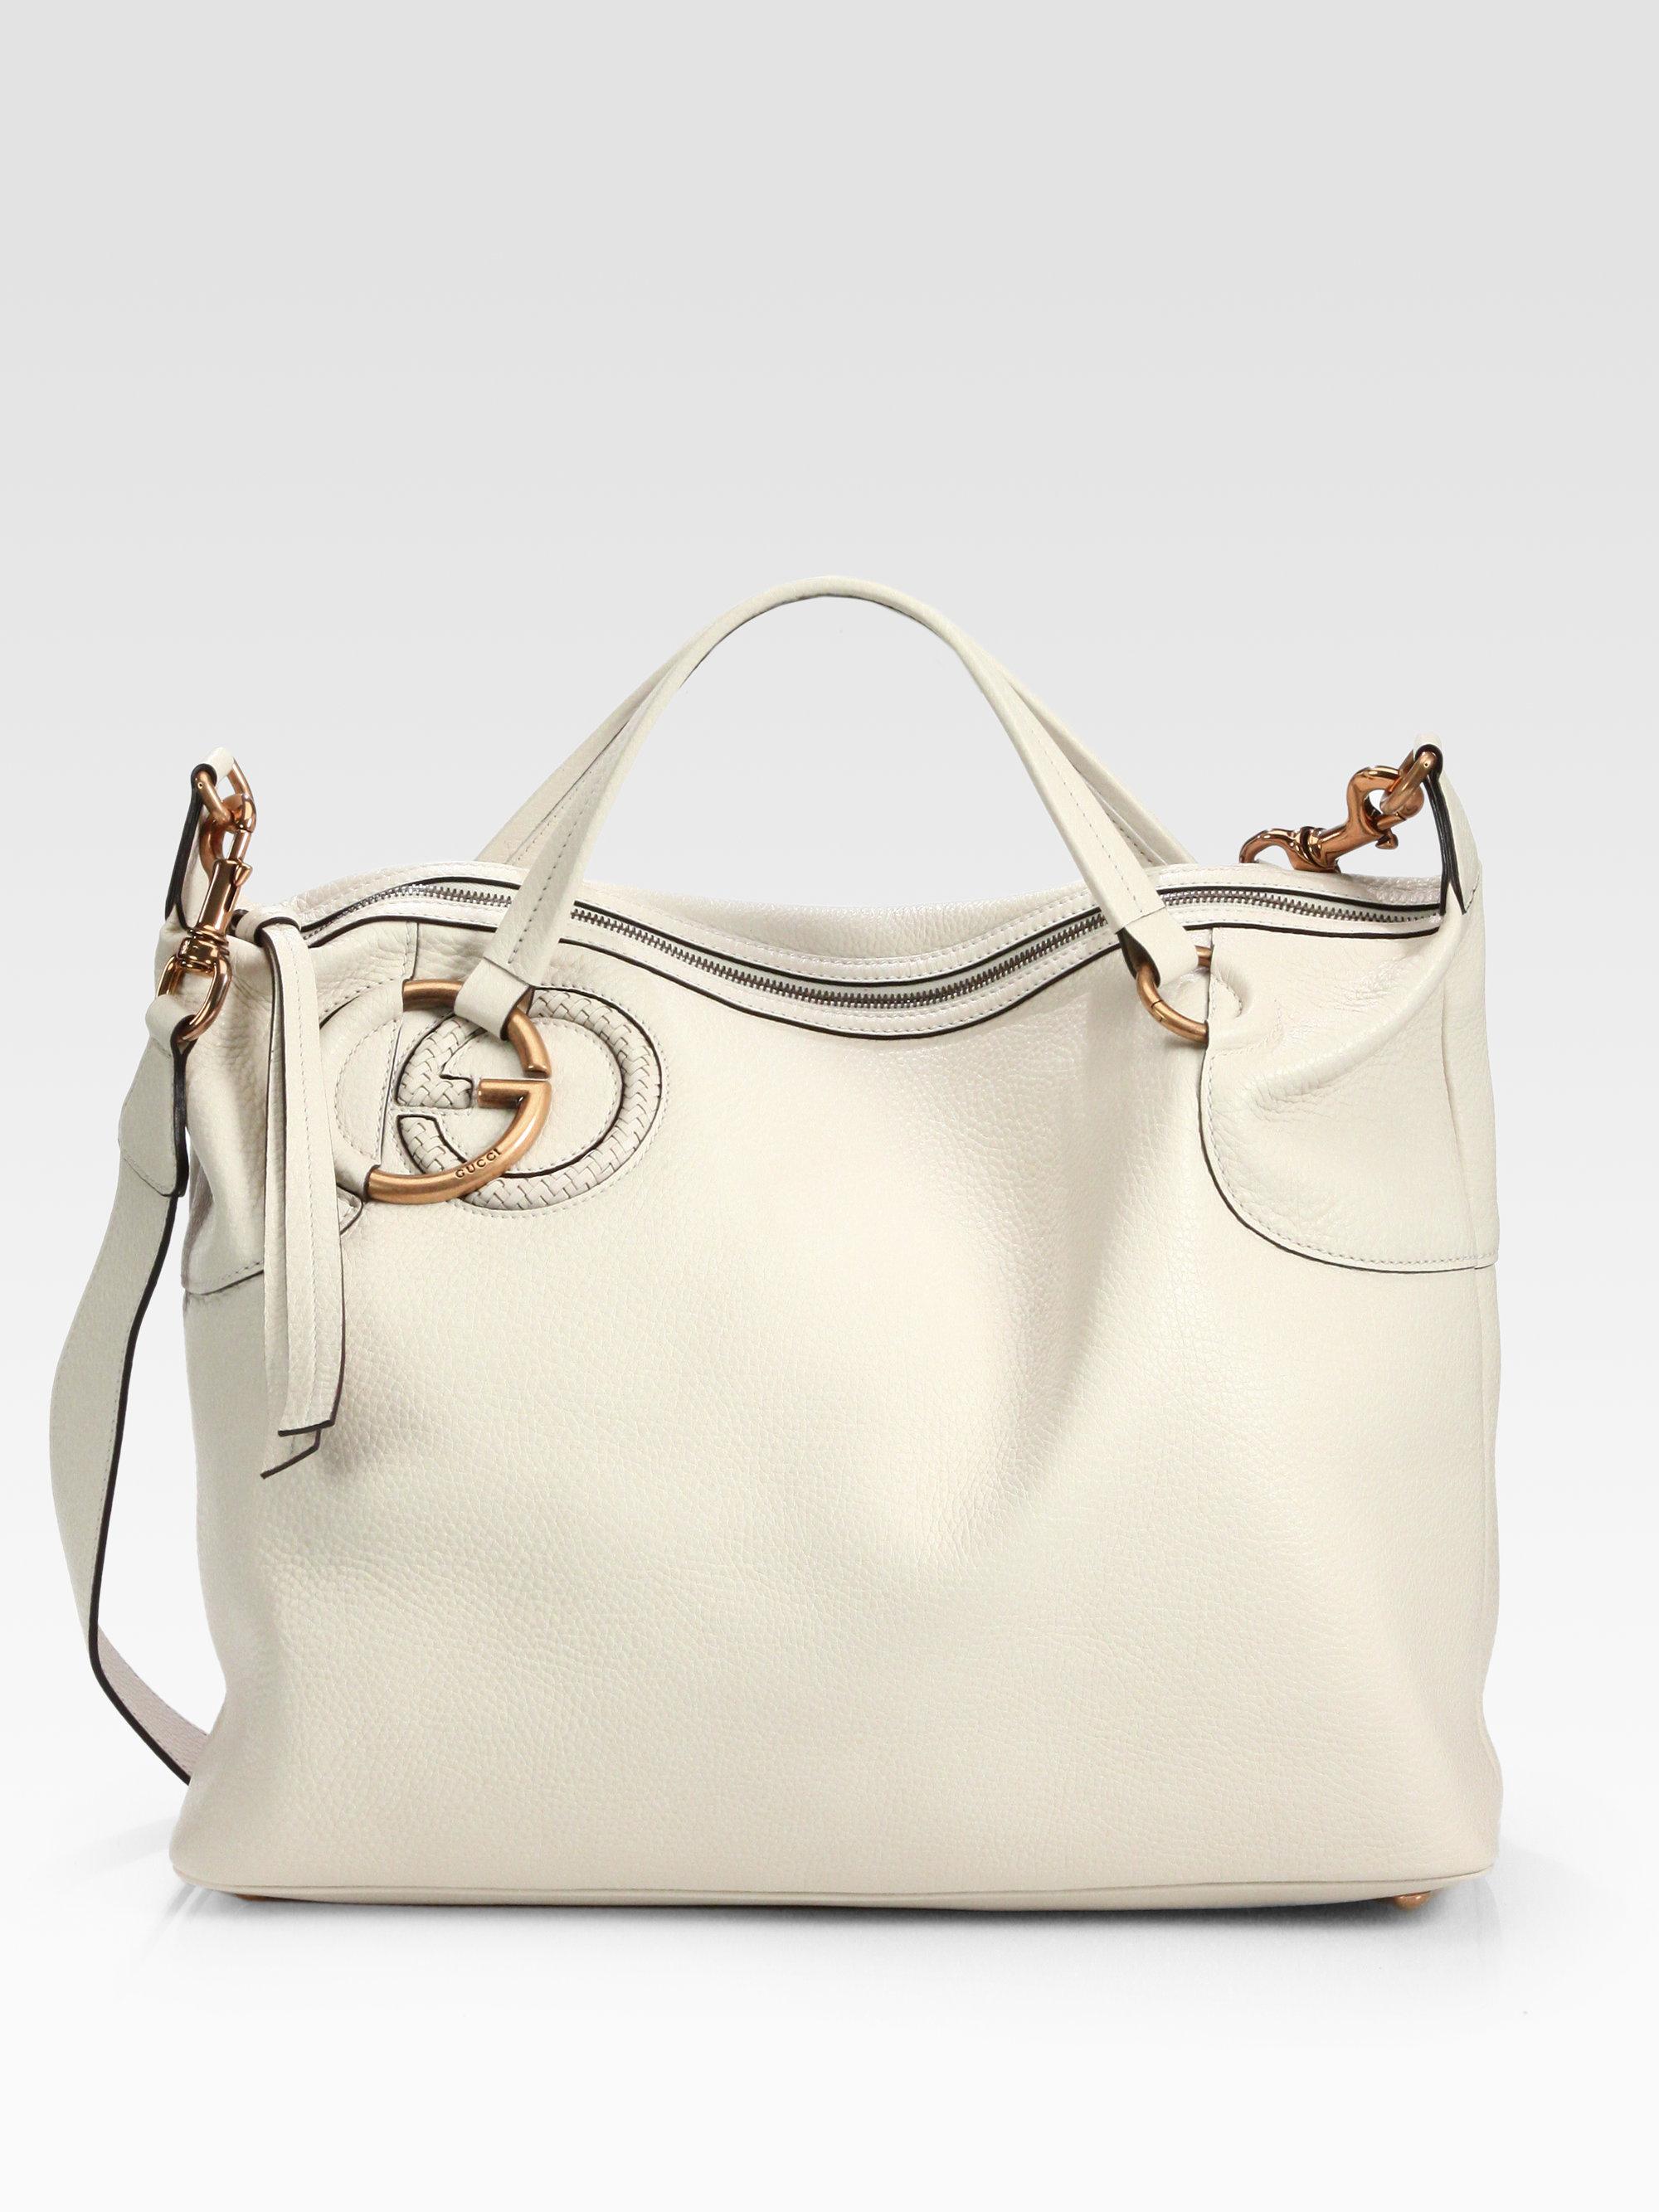 bb02da526c8 Lyst - Gucci Twill Leather Top Handle Bag in White